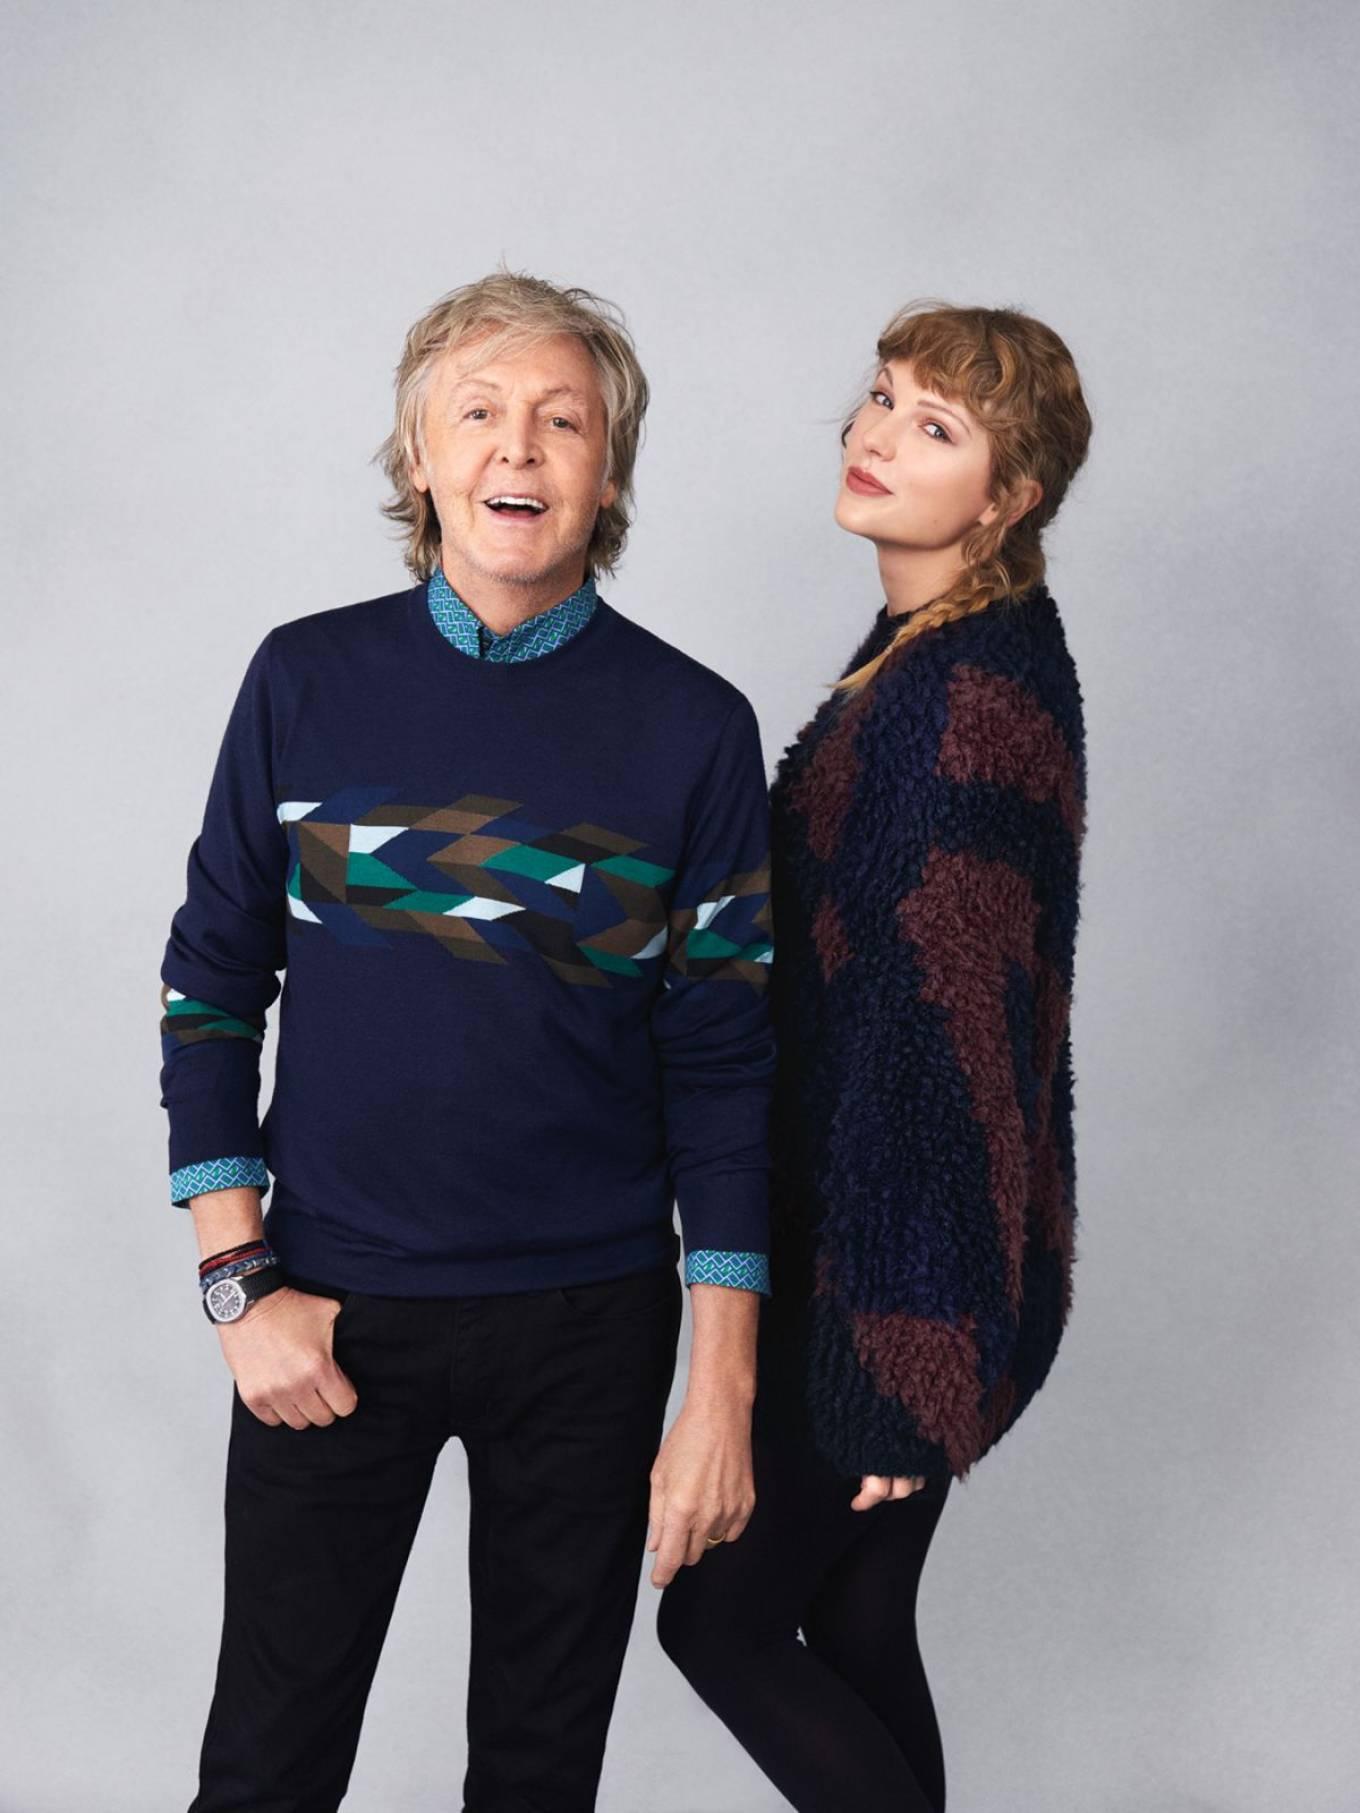 Taylor Swift and Sir Paul McCartney - Rolling Stone Magazine (November 2020)